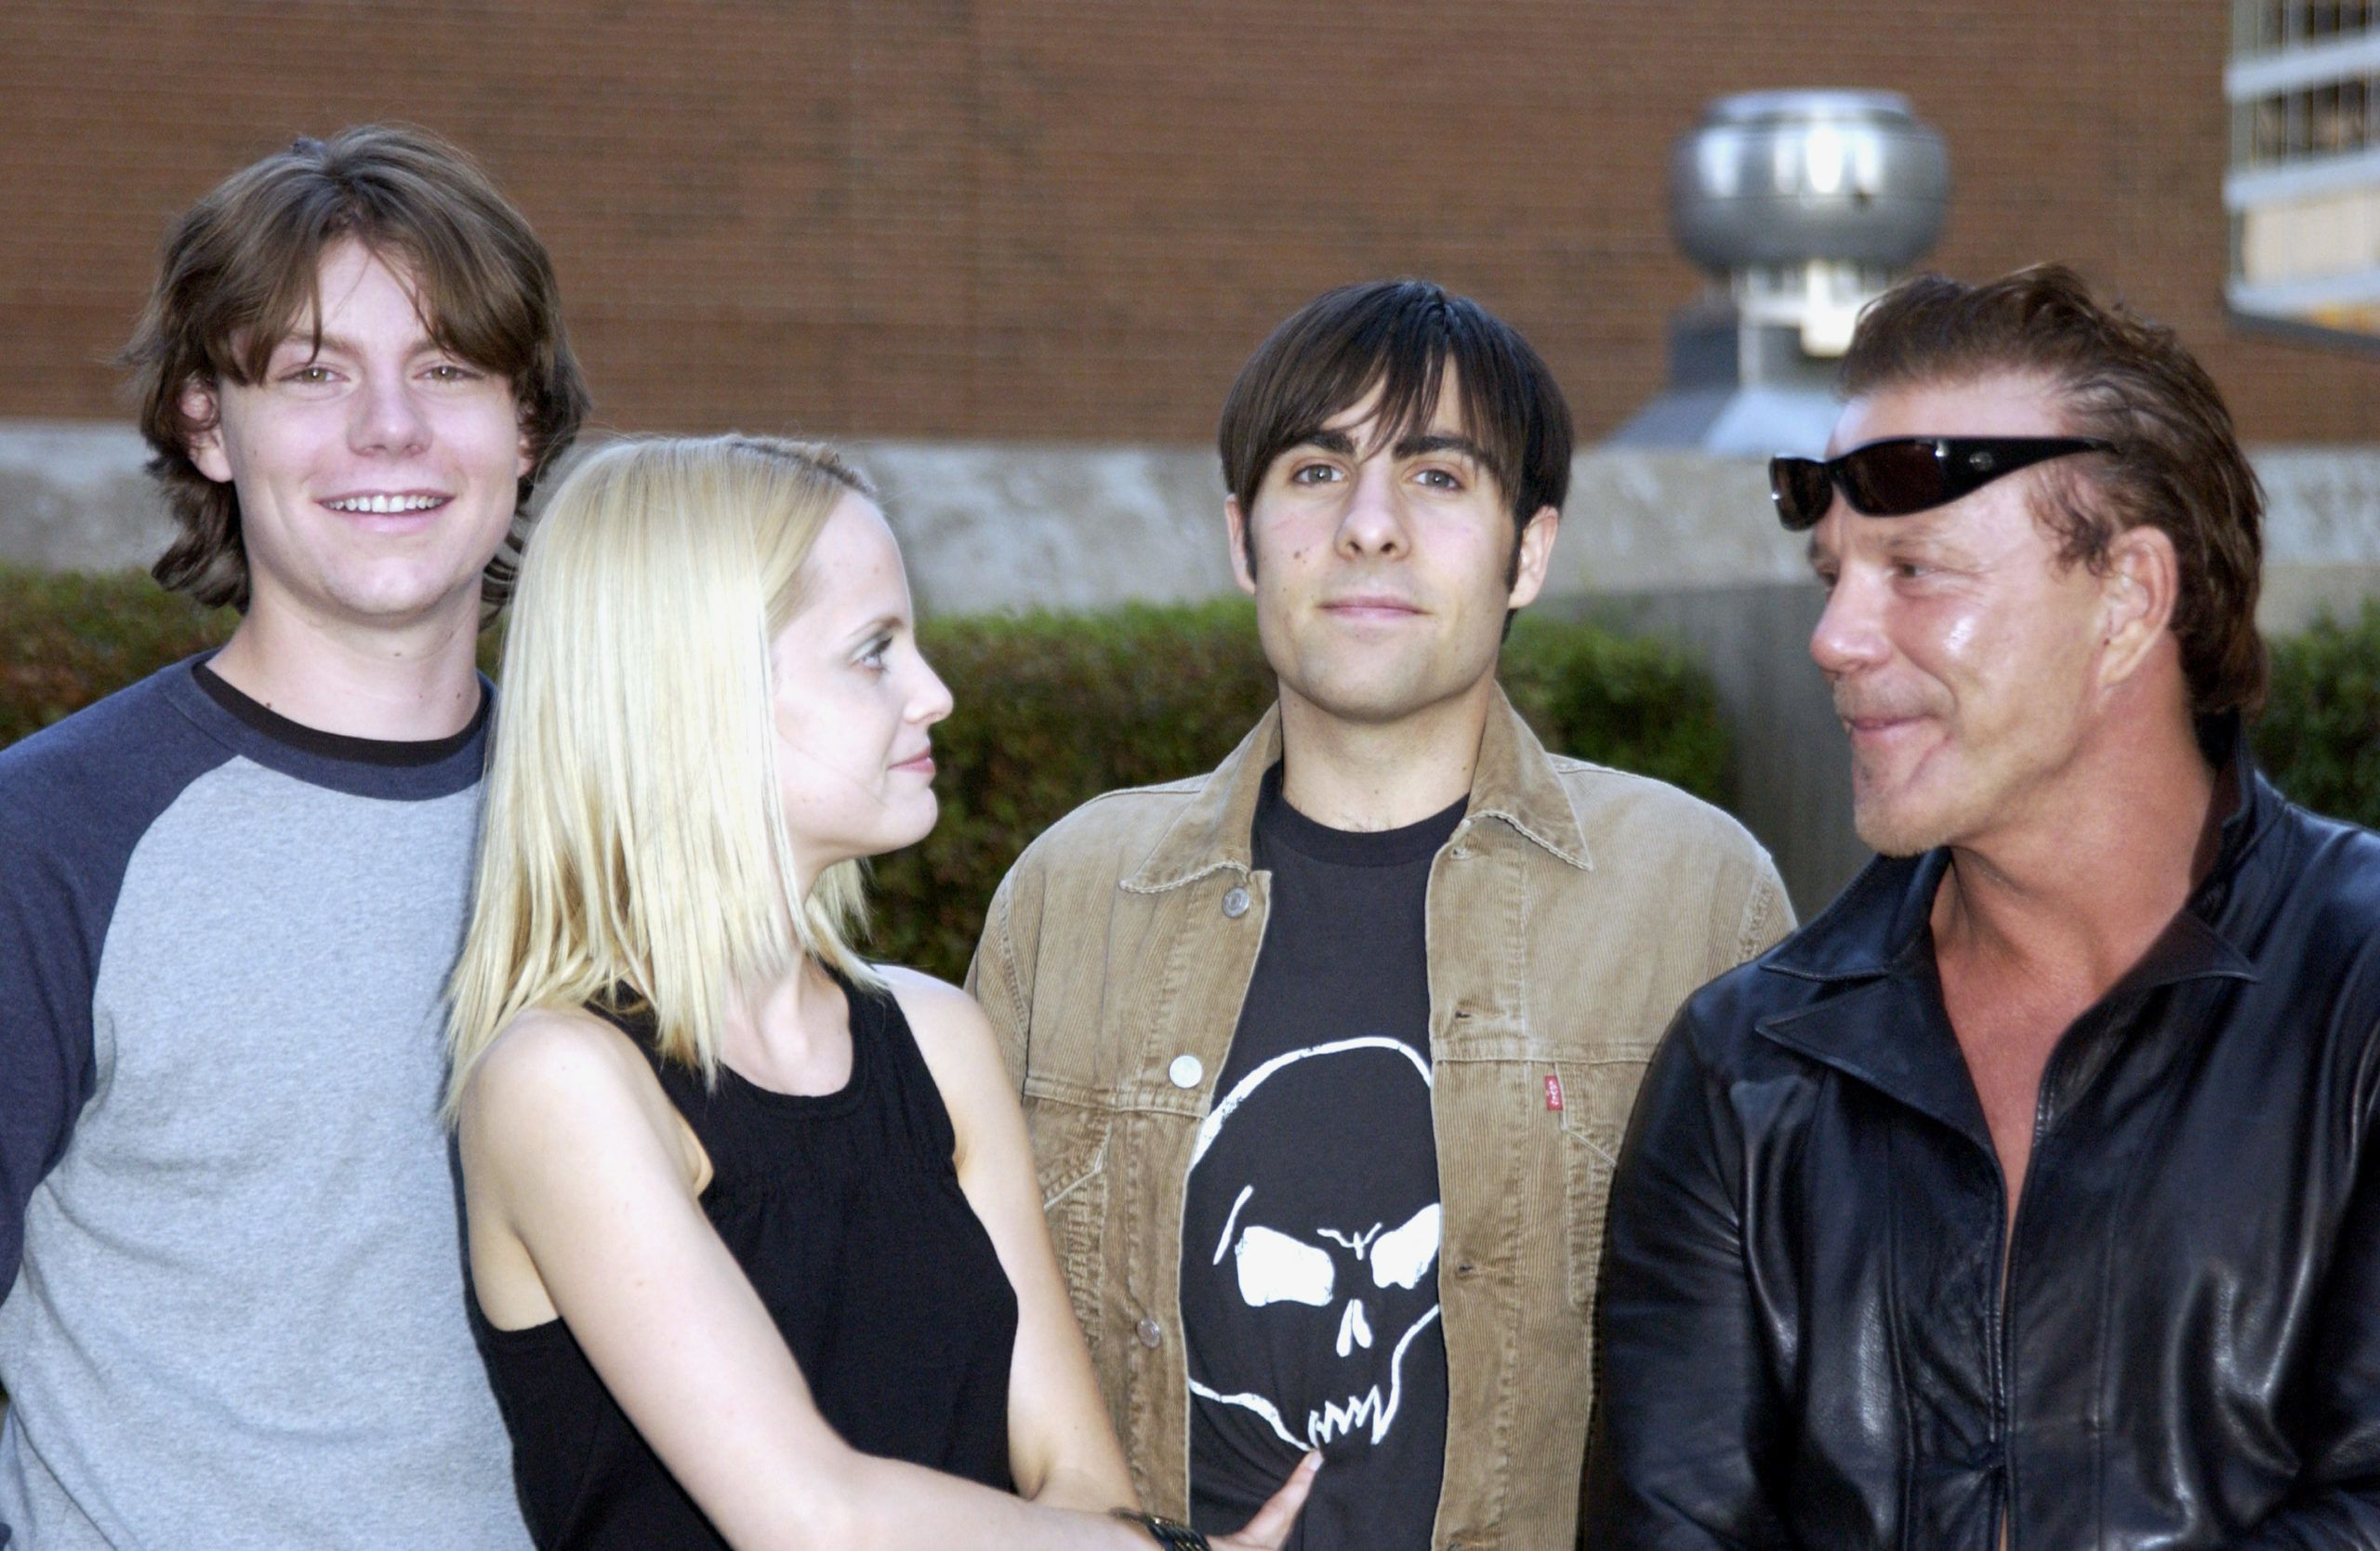 Mickey Rourke és ifjú kollégái a Por világpremierjén Torontóban (Photo by J. Vespa/WireImage)